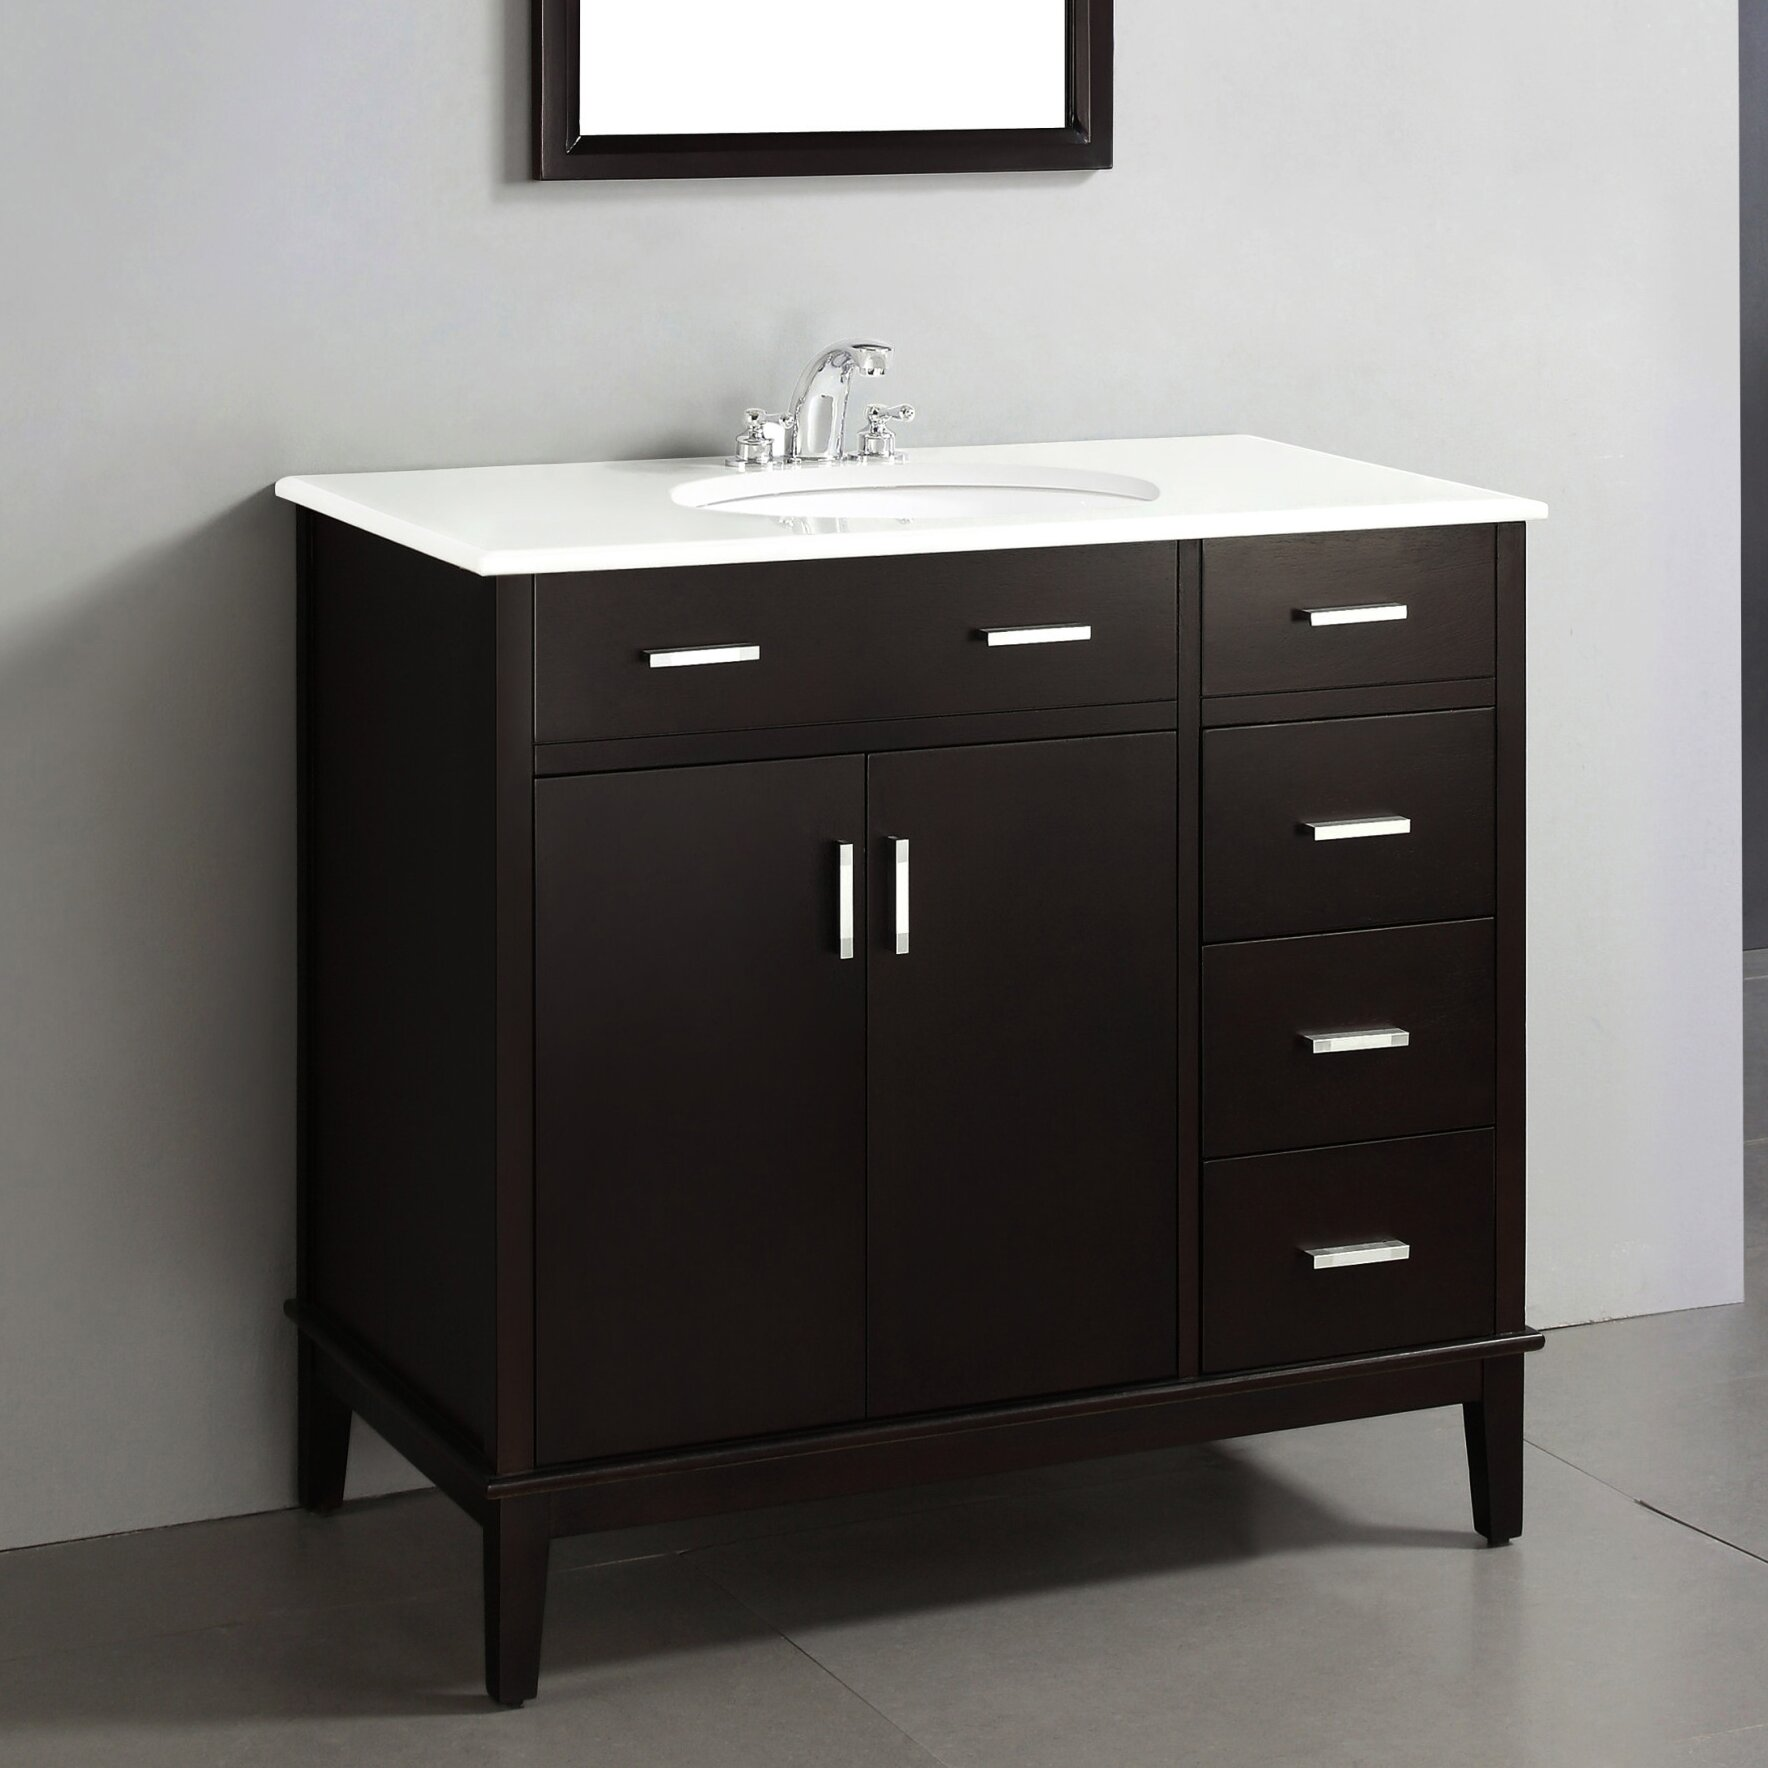 simpli home urban loft 36 single bathroom vanity set reviews wayfair